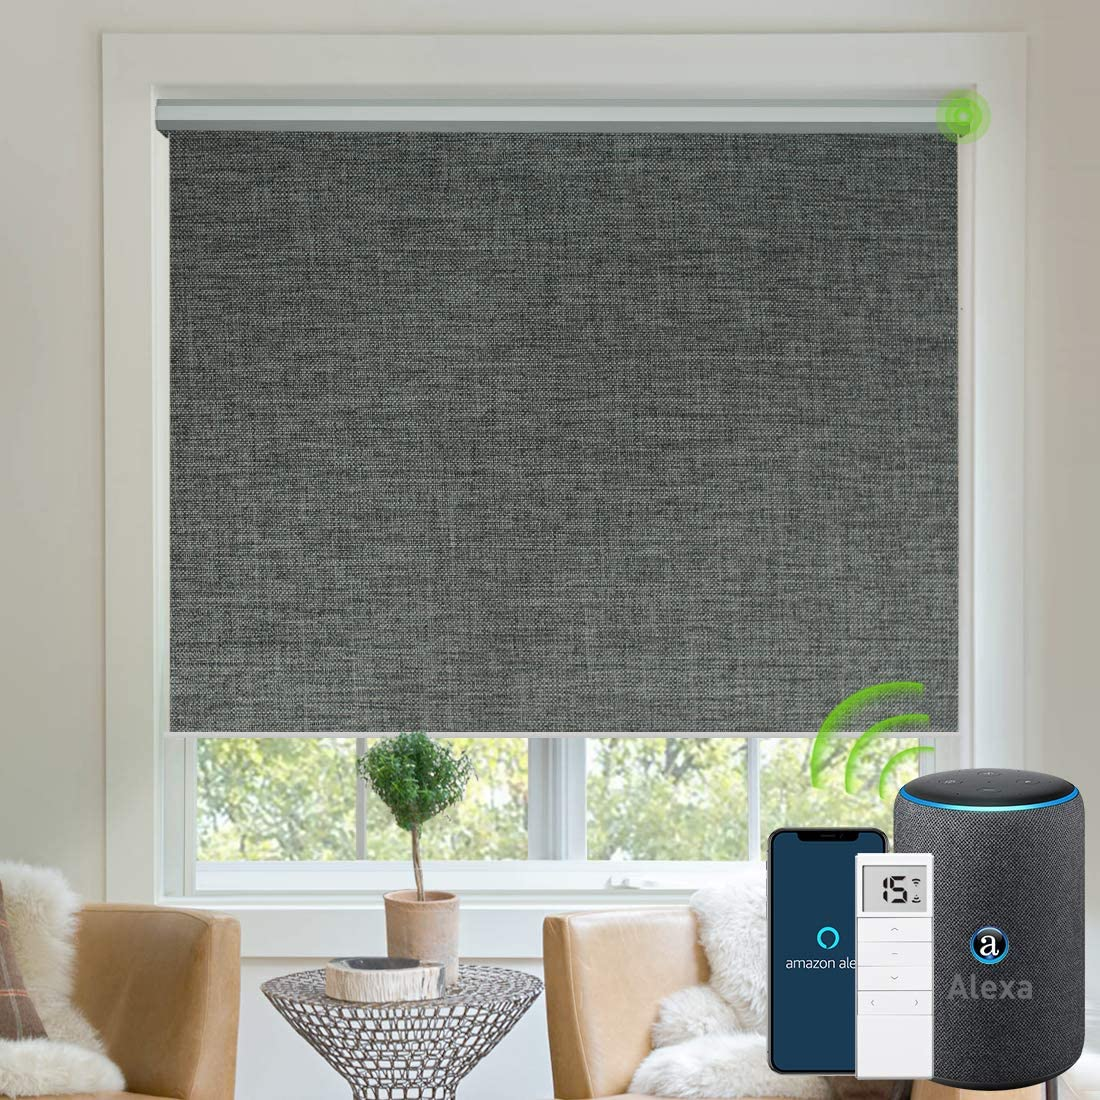 Yoolax Motorized Blinds Blackout Fabric Automatic Shades Remote Control Cordless Room Darkening Window Blinds (Dark Grey)